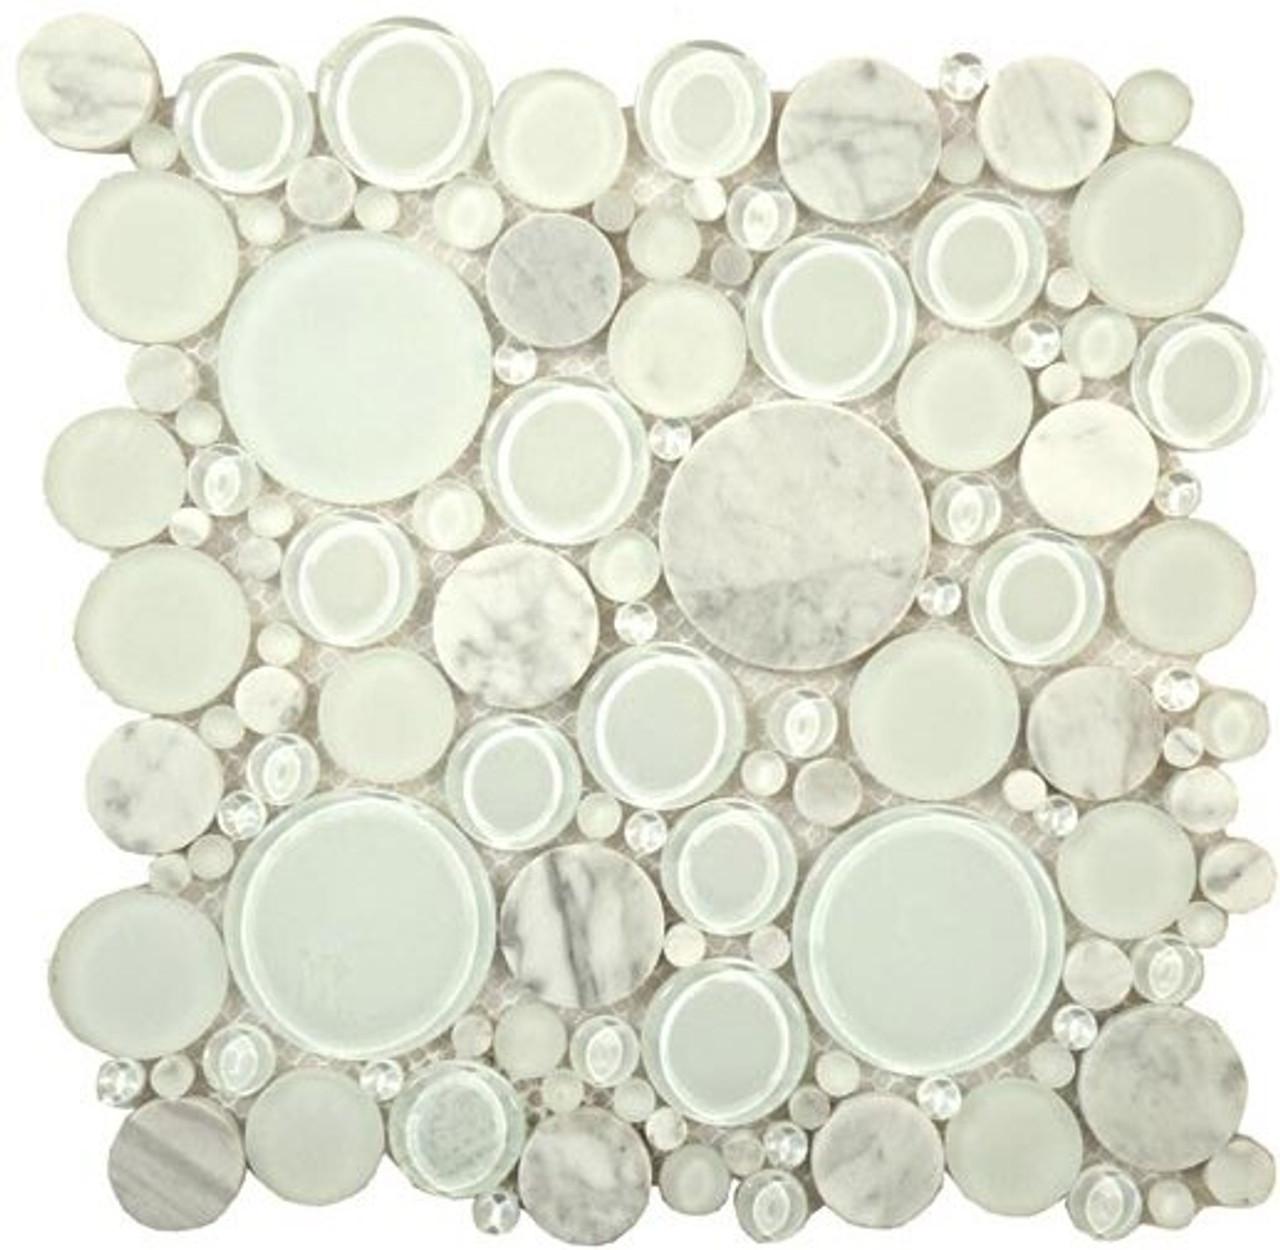 Bella Glass Tiles Bubble Series Random Circles White Dove